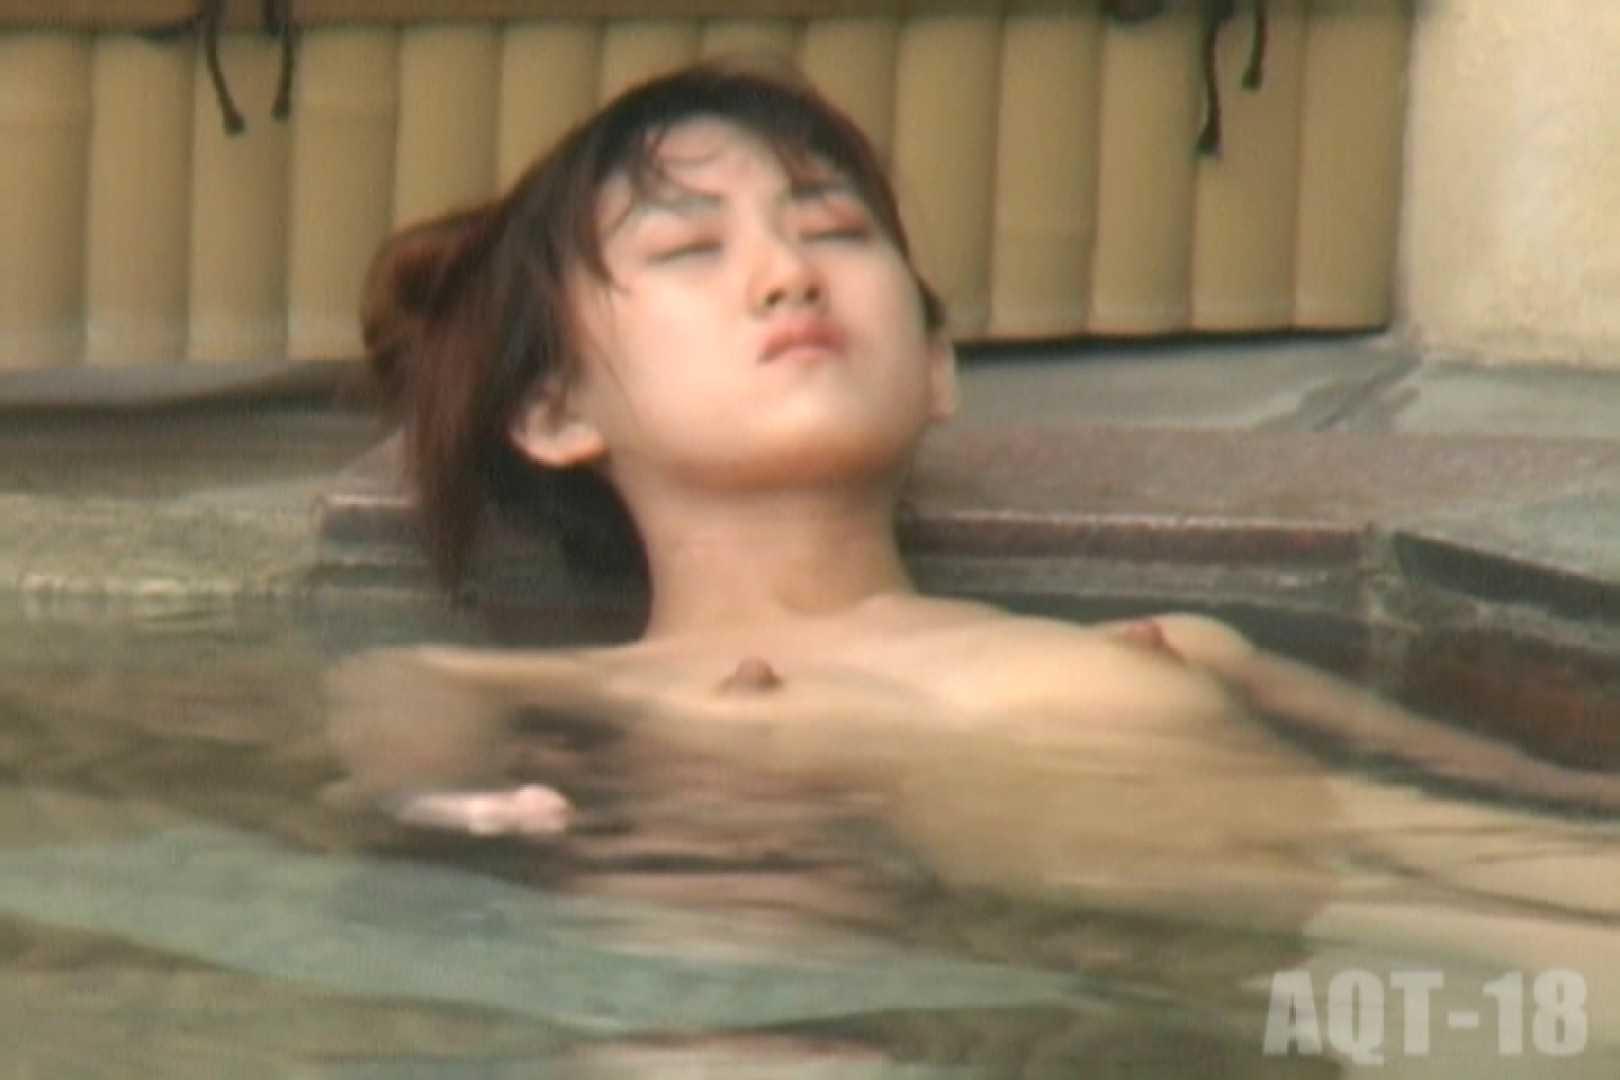 Aquaな露天風呂Vol.862 盗撮師作品  99pic 30